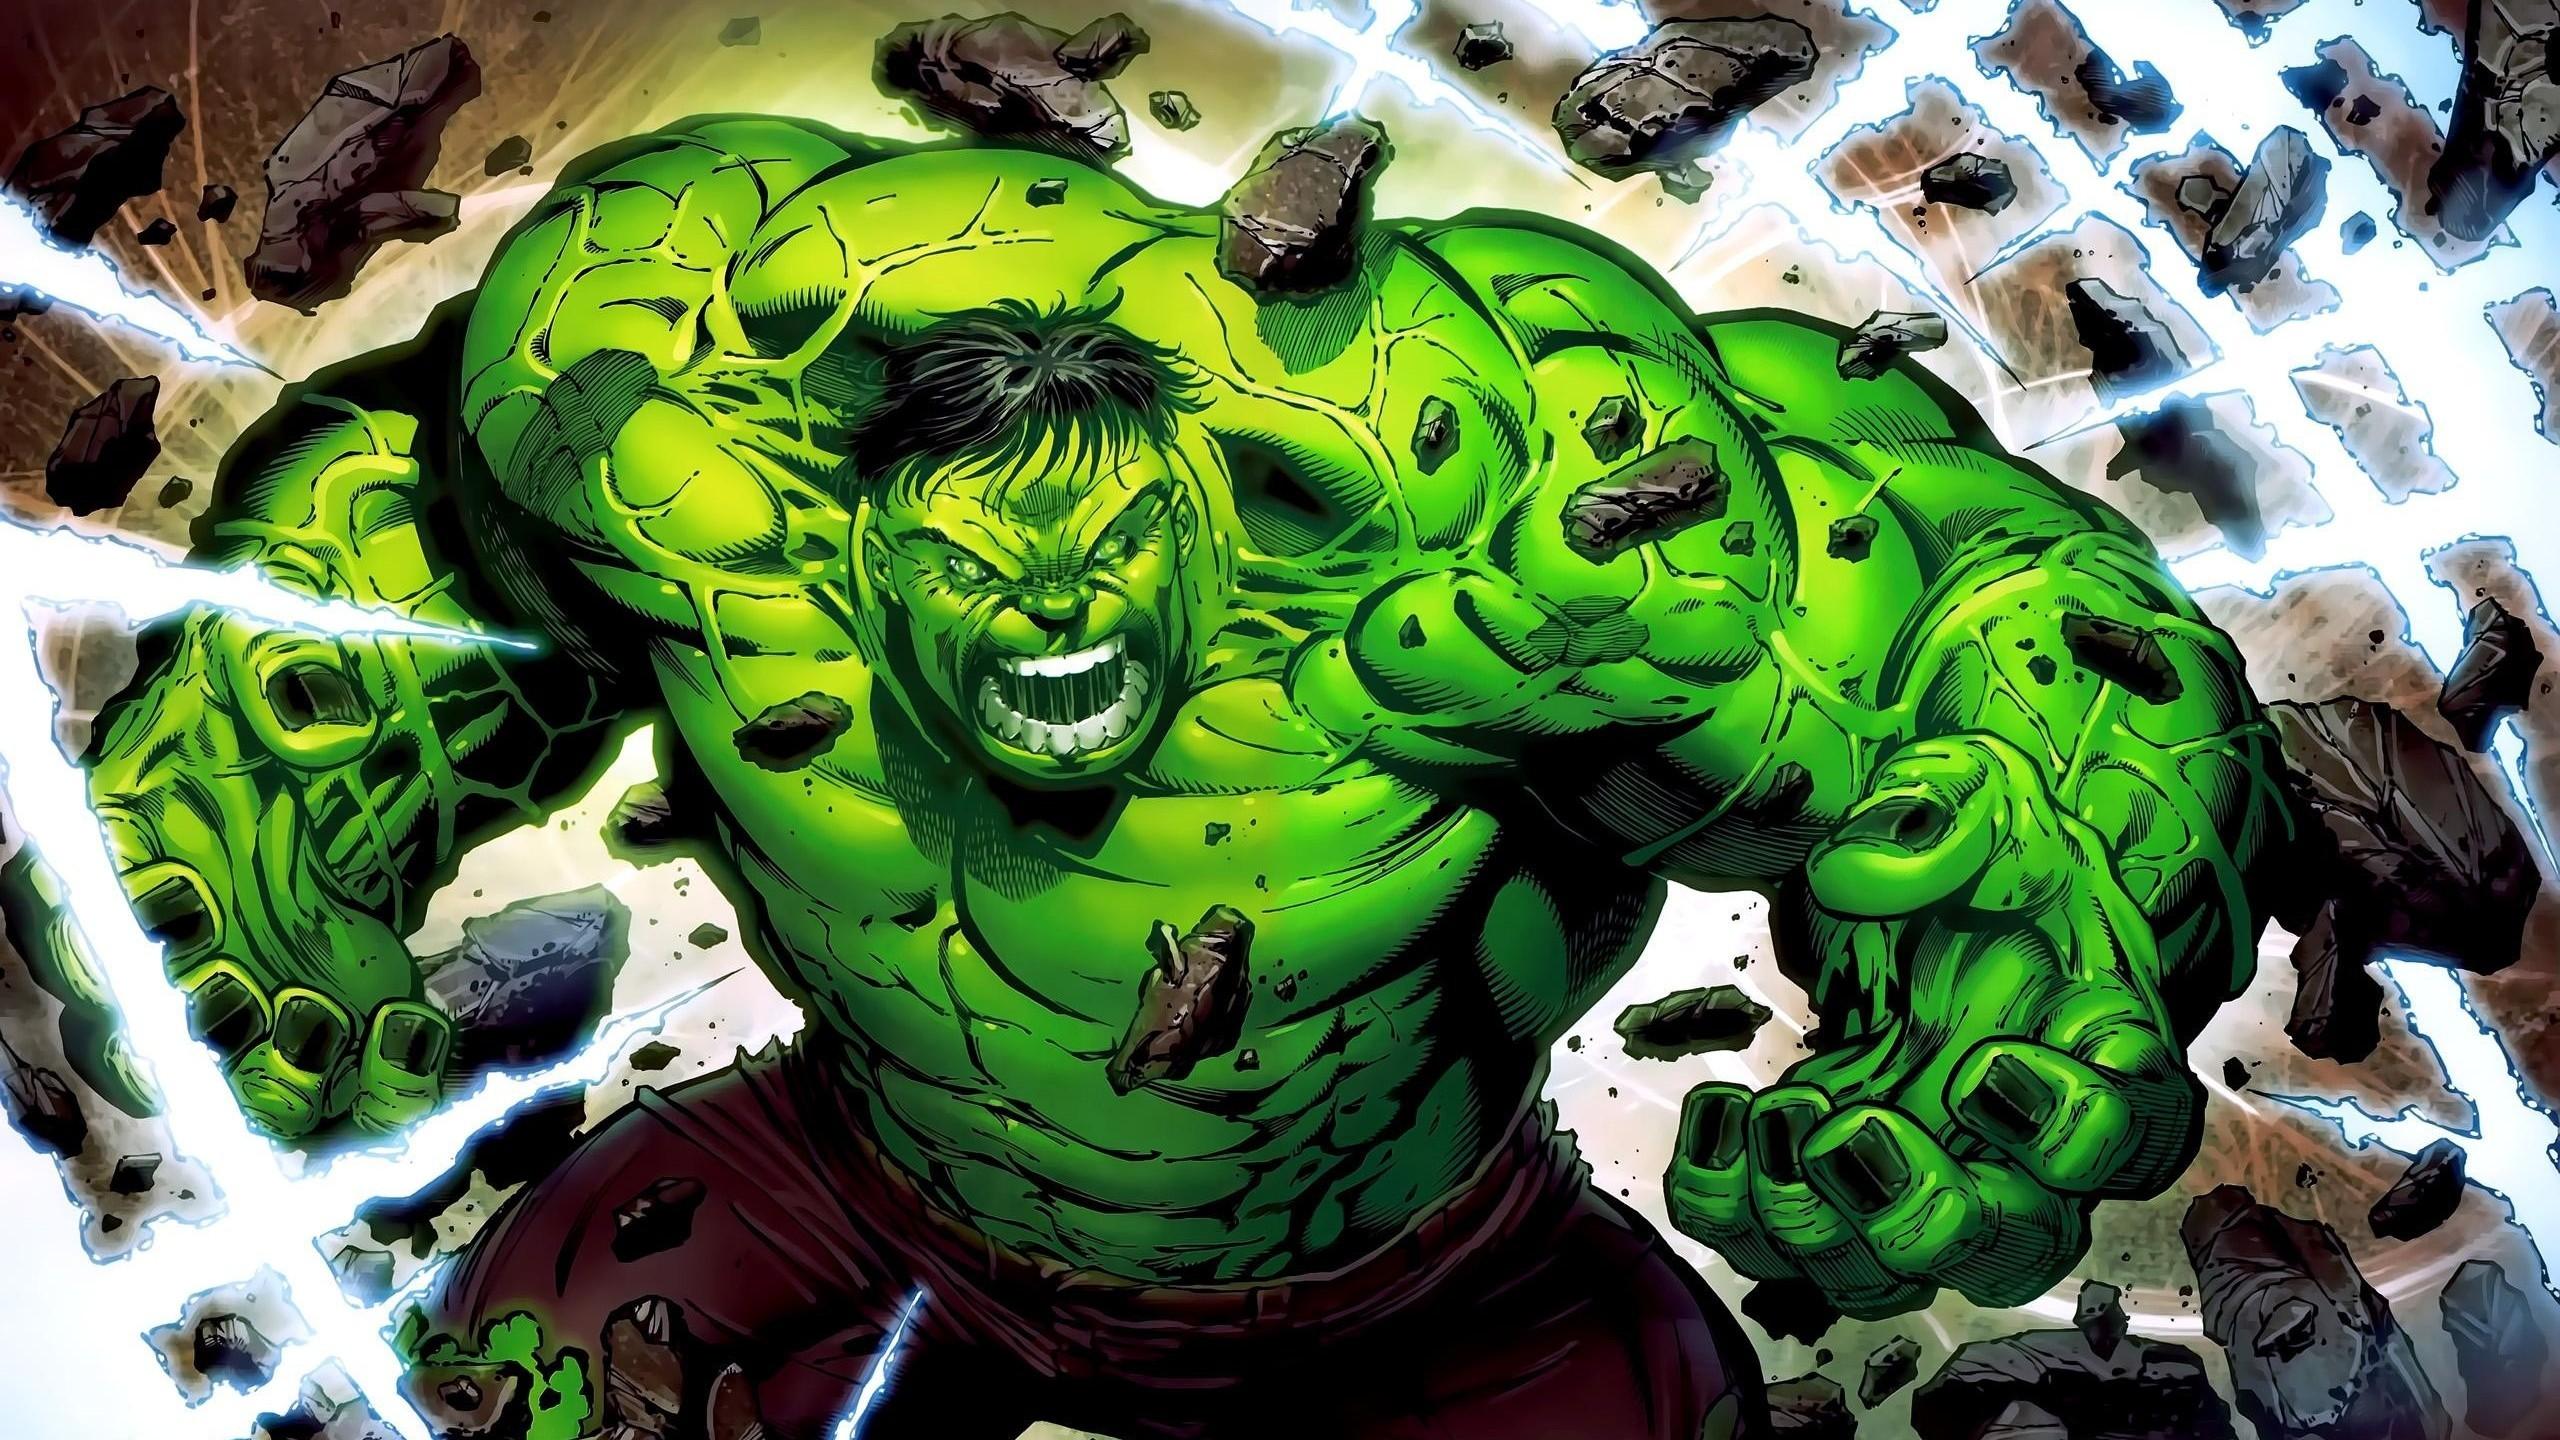 74 Hd Hulk Wallpapers on WallpaperPlay 2560x1440